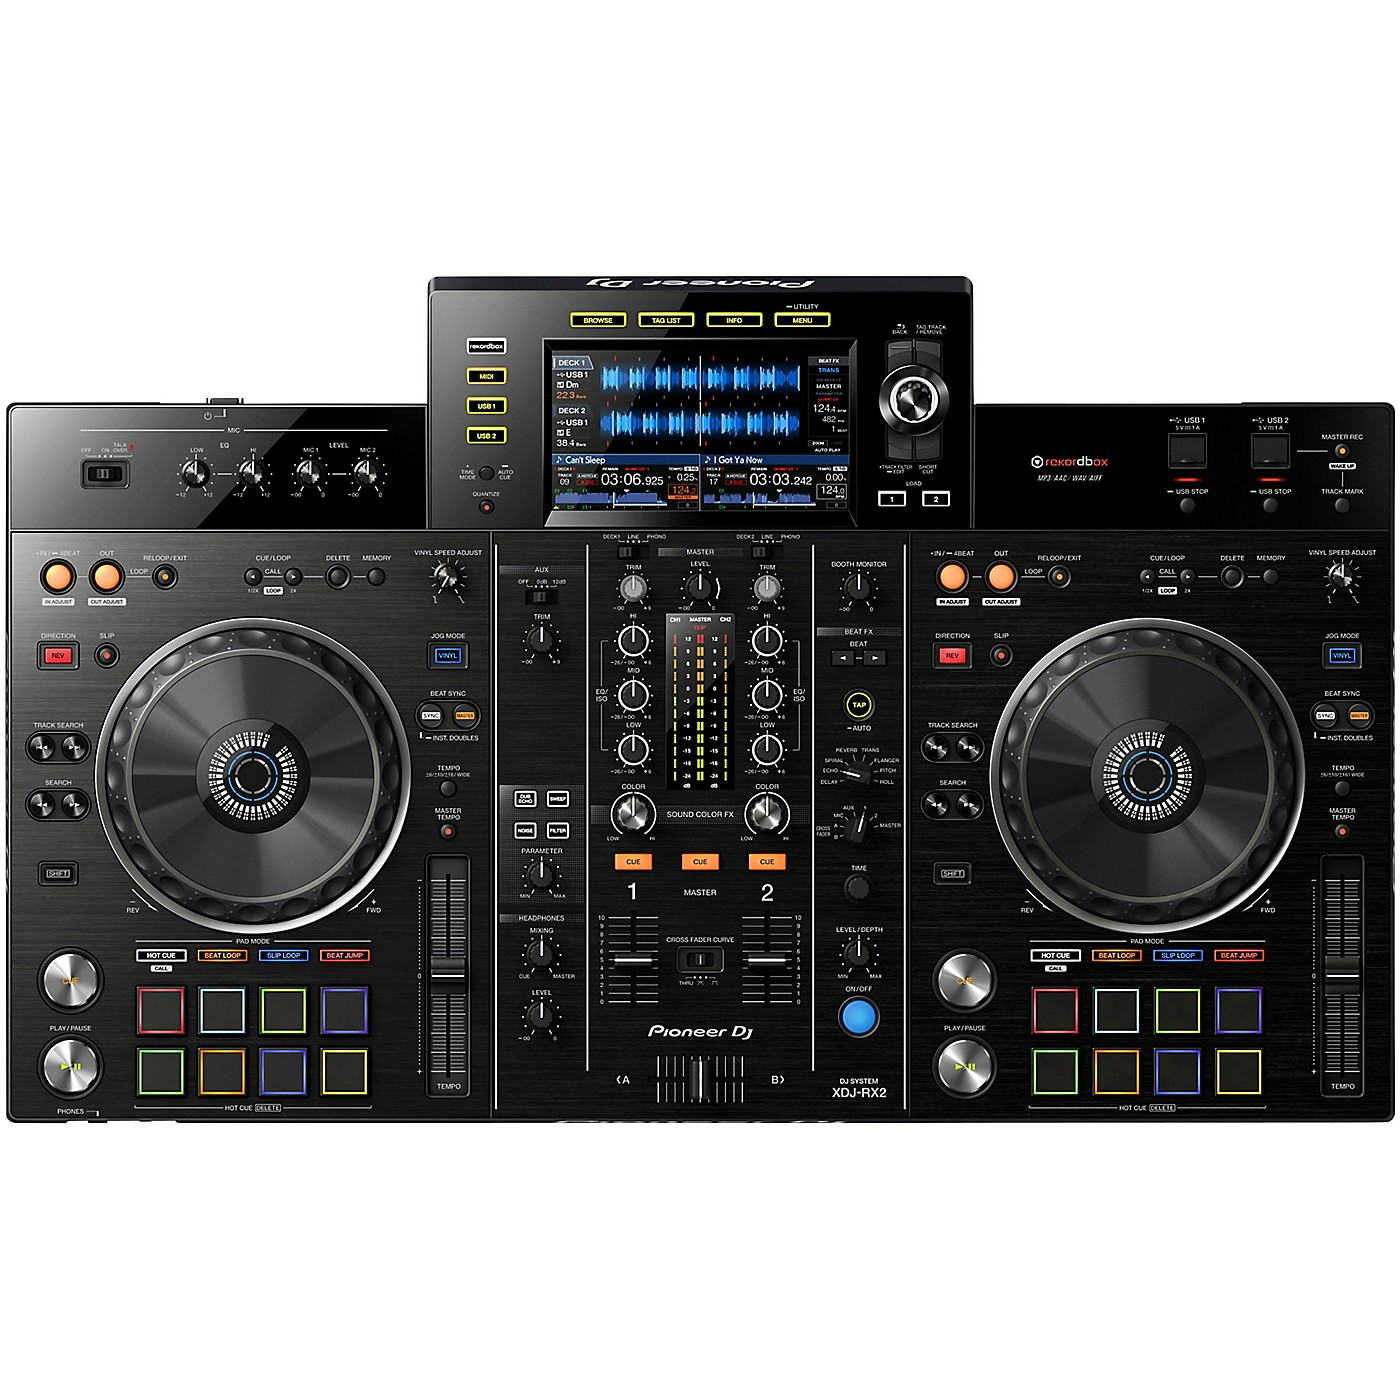 Pioneer DJ XDJ-RX2 Professional DJ Controller with Touchscreen Display and Rekordbox Integration thumbnail